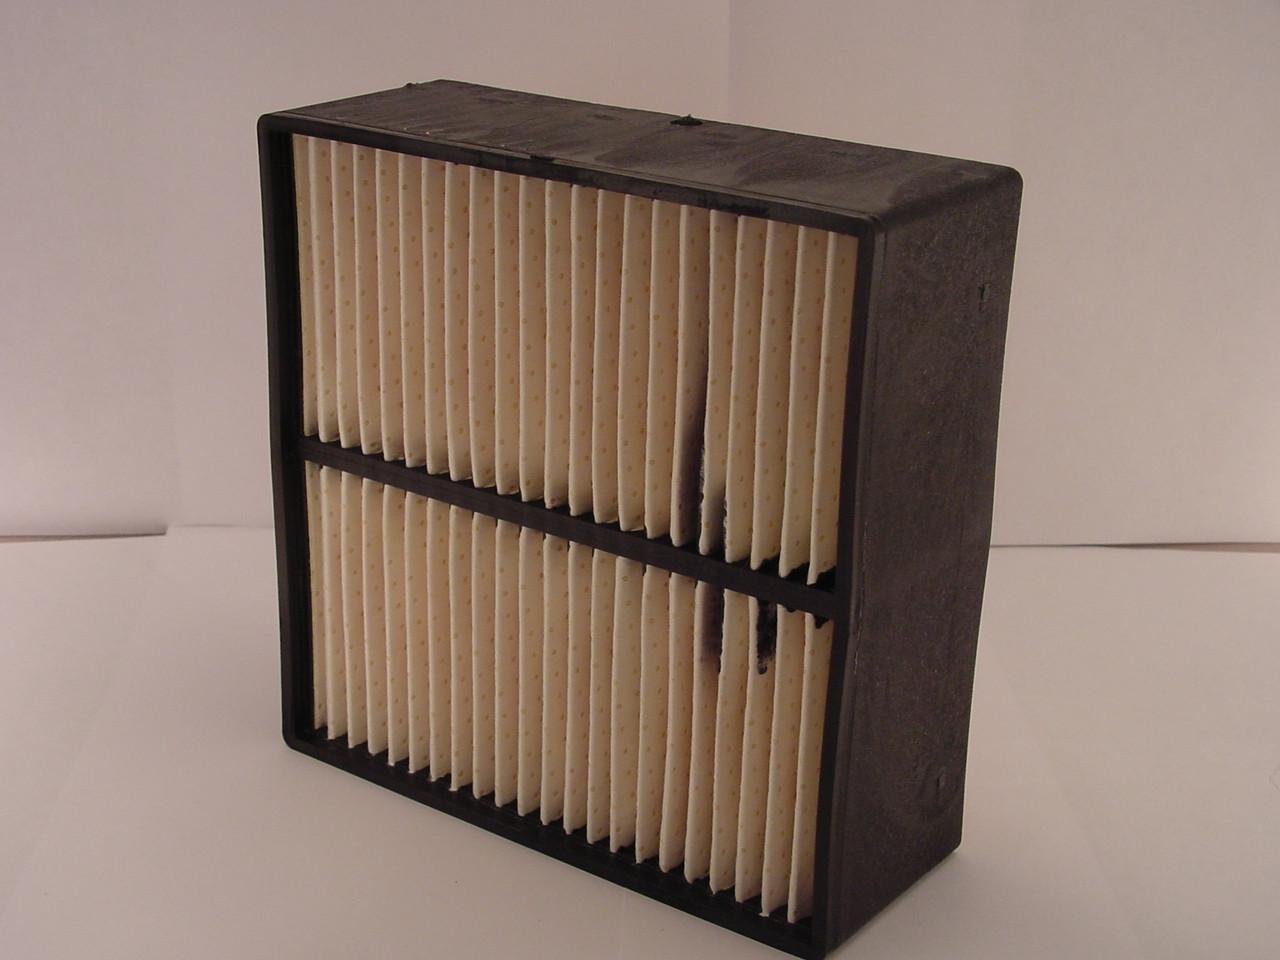 01810B-10 Micron Separ 2000/18 Replacement Element w/ Buna Gasket